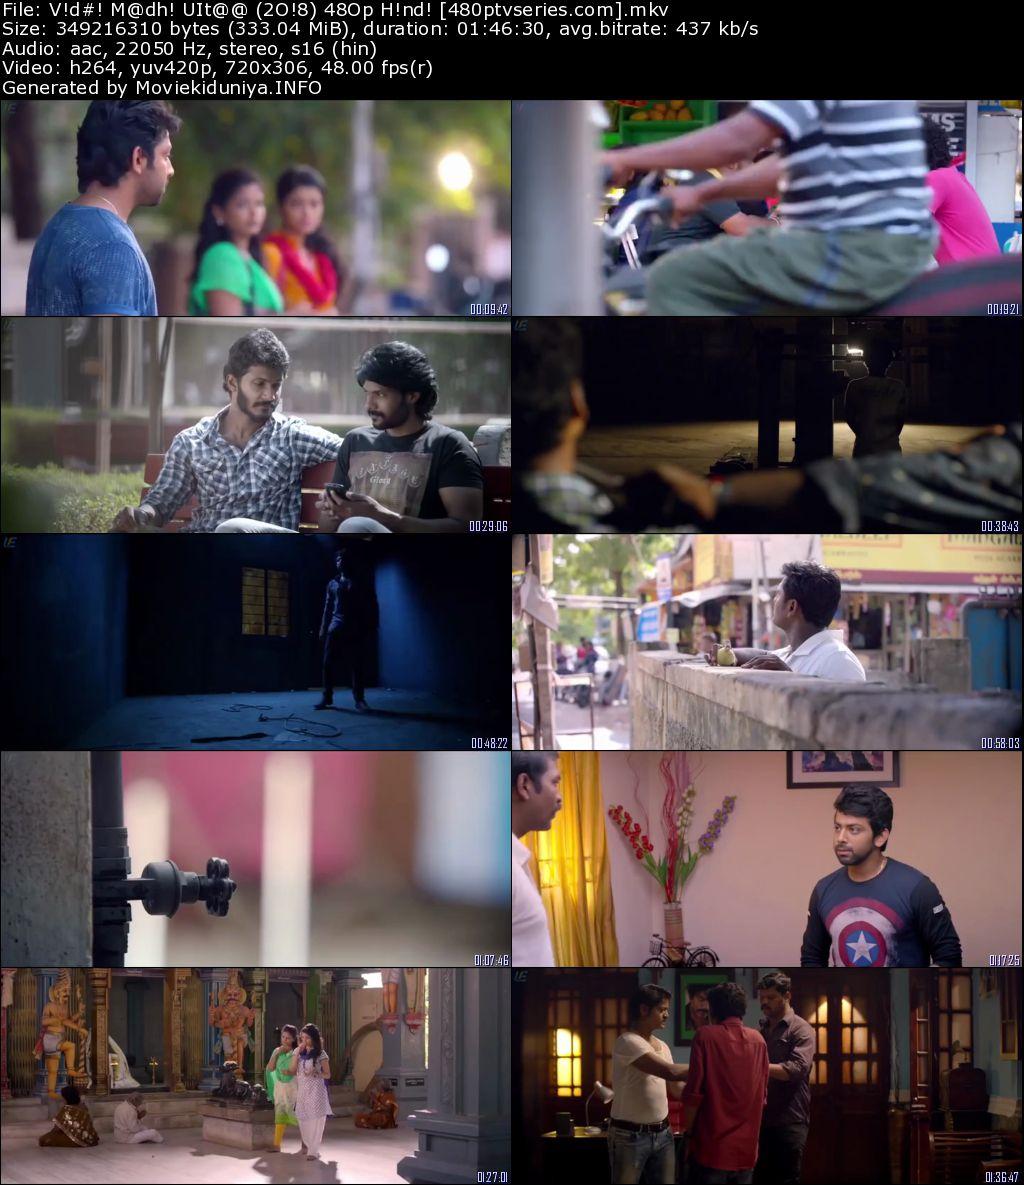 Vidhi Madhi Ultaa (2018) 300Mb Full Hindi Dual Audio Movie